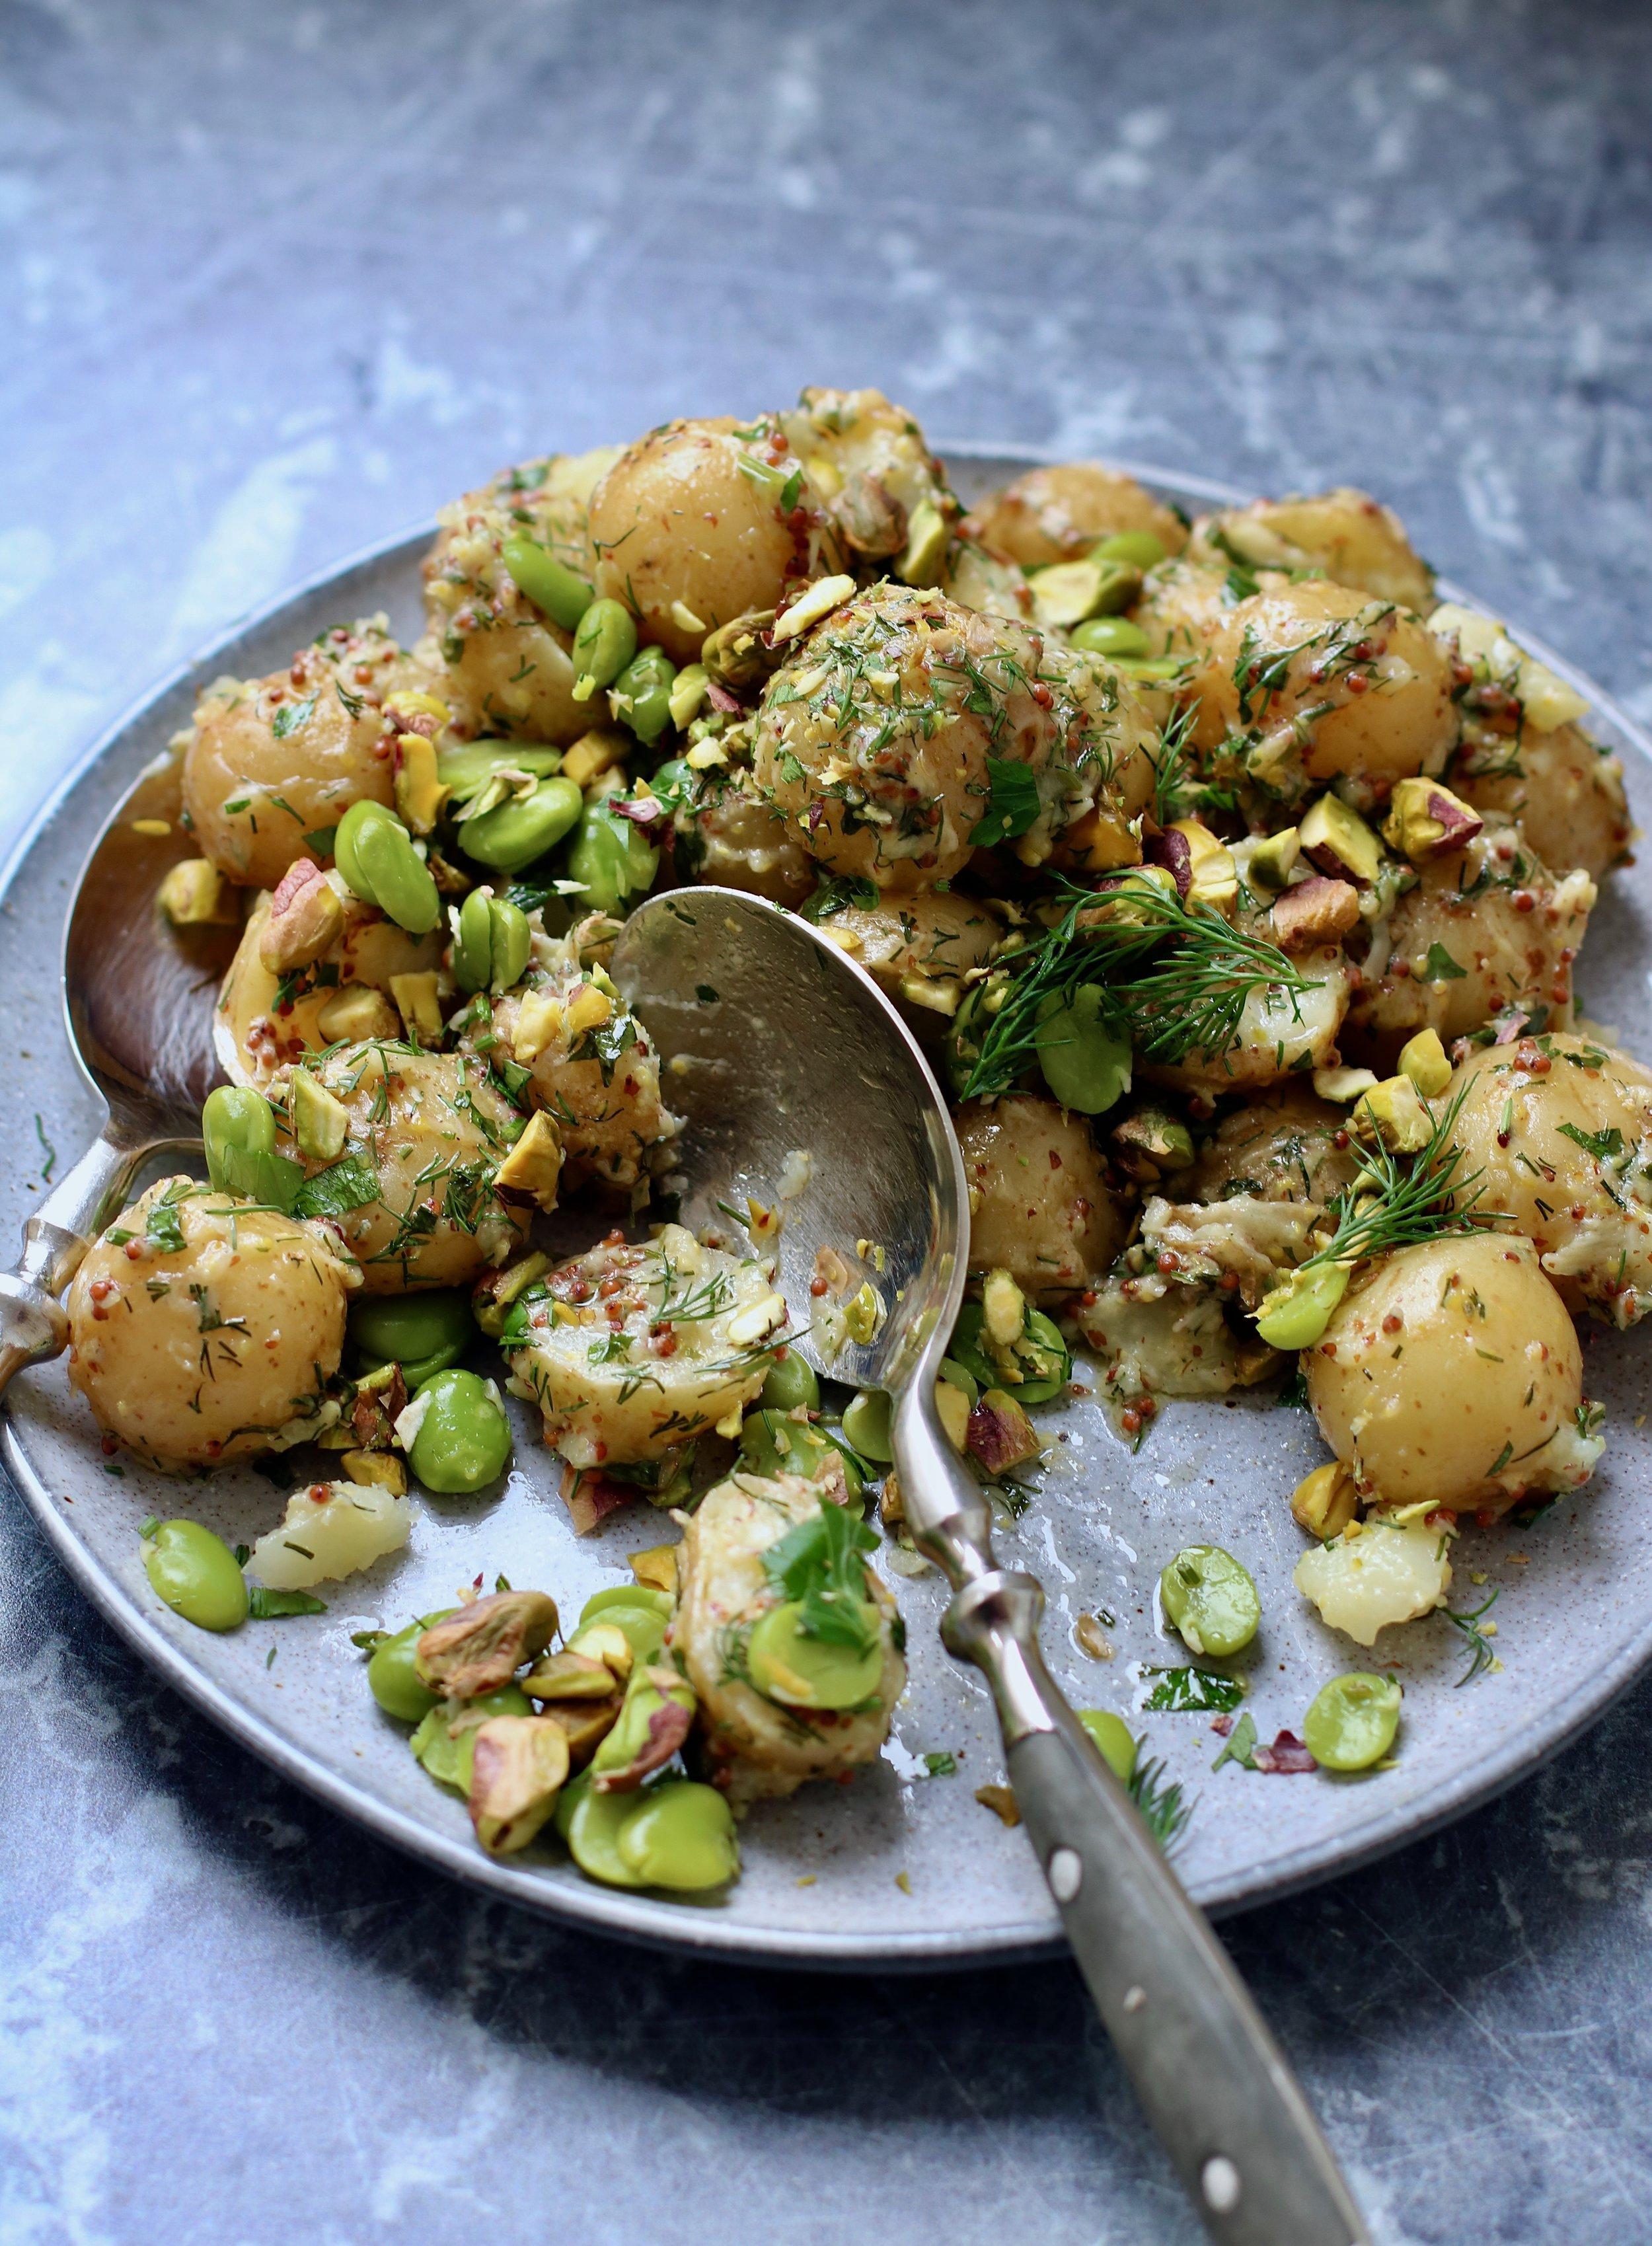 Potato and pistachio salad